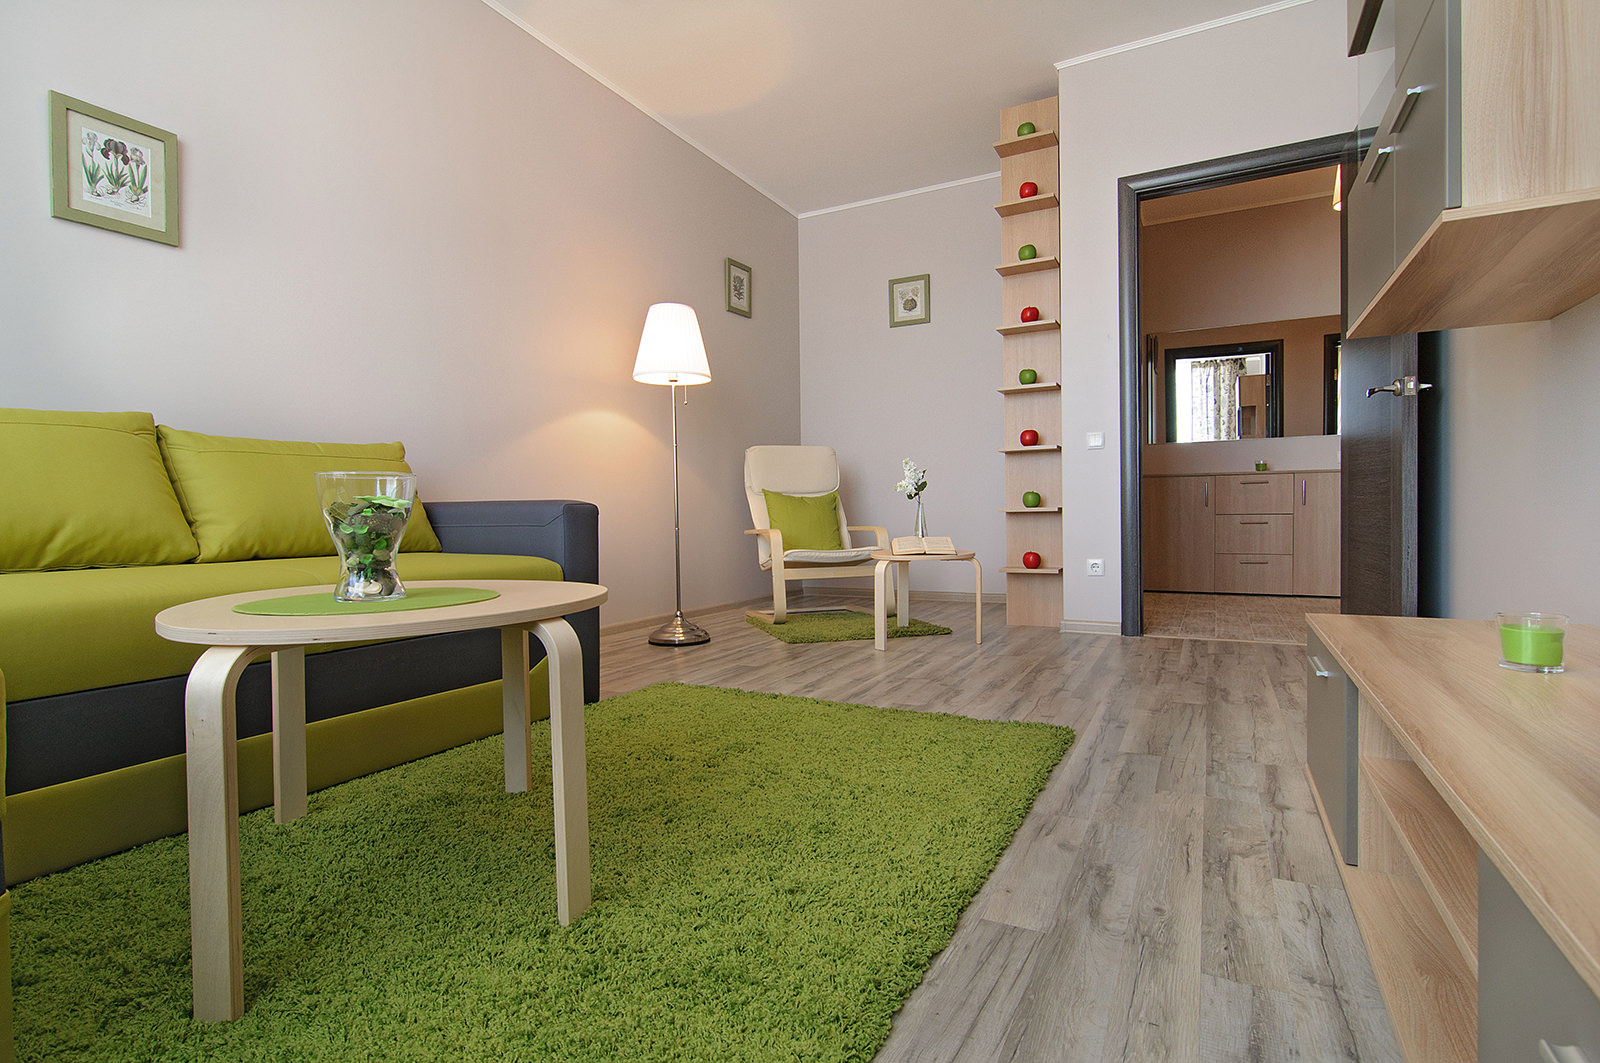 Однокомнатная квартира в зеленом цвете